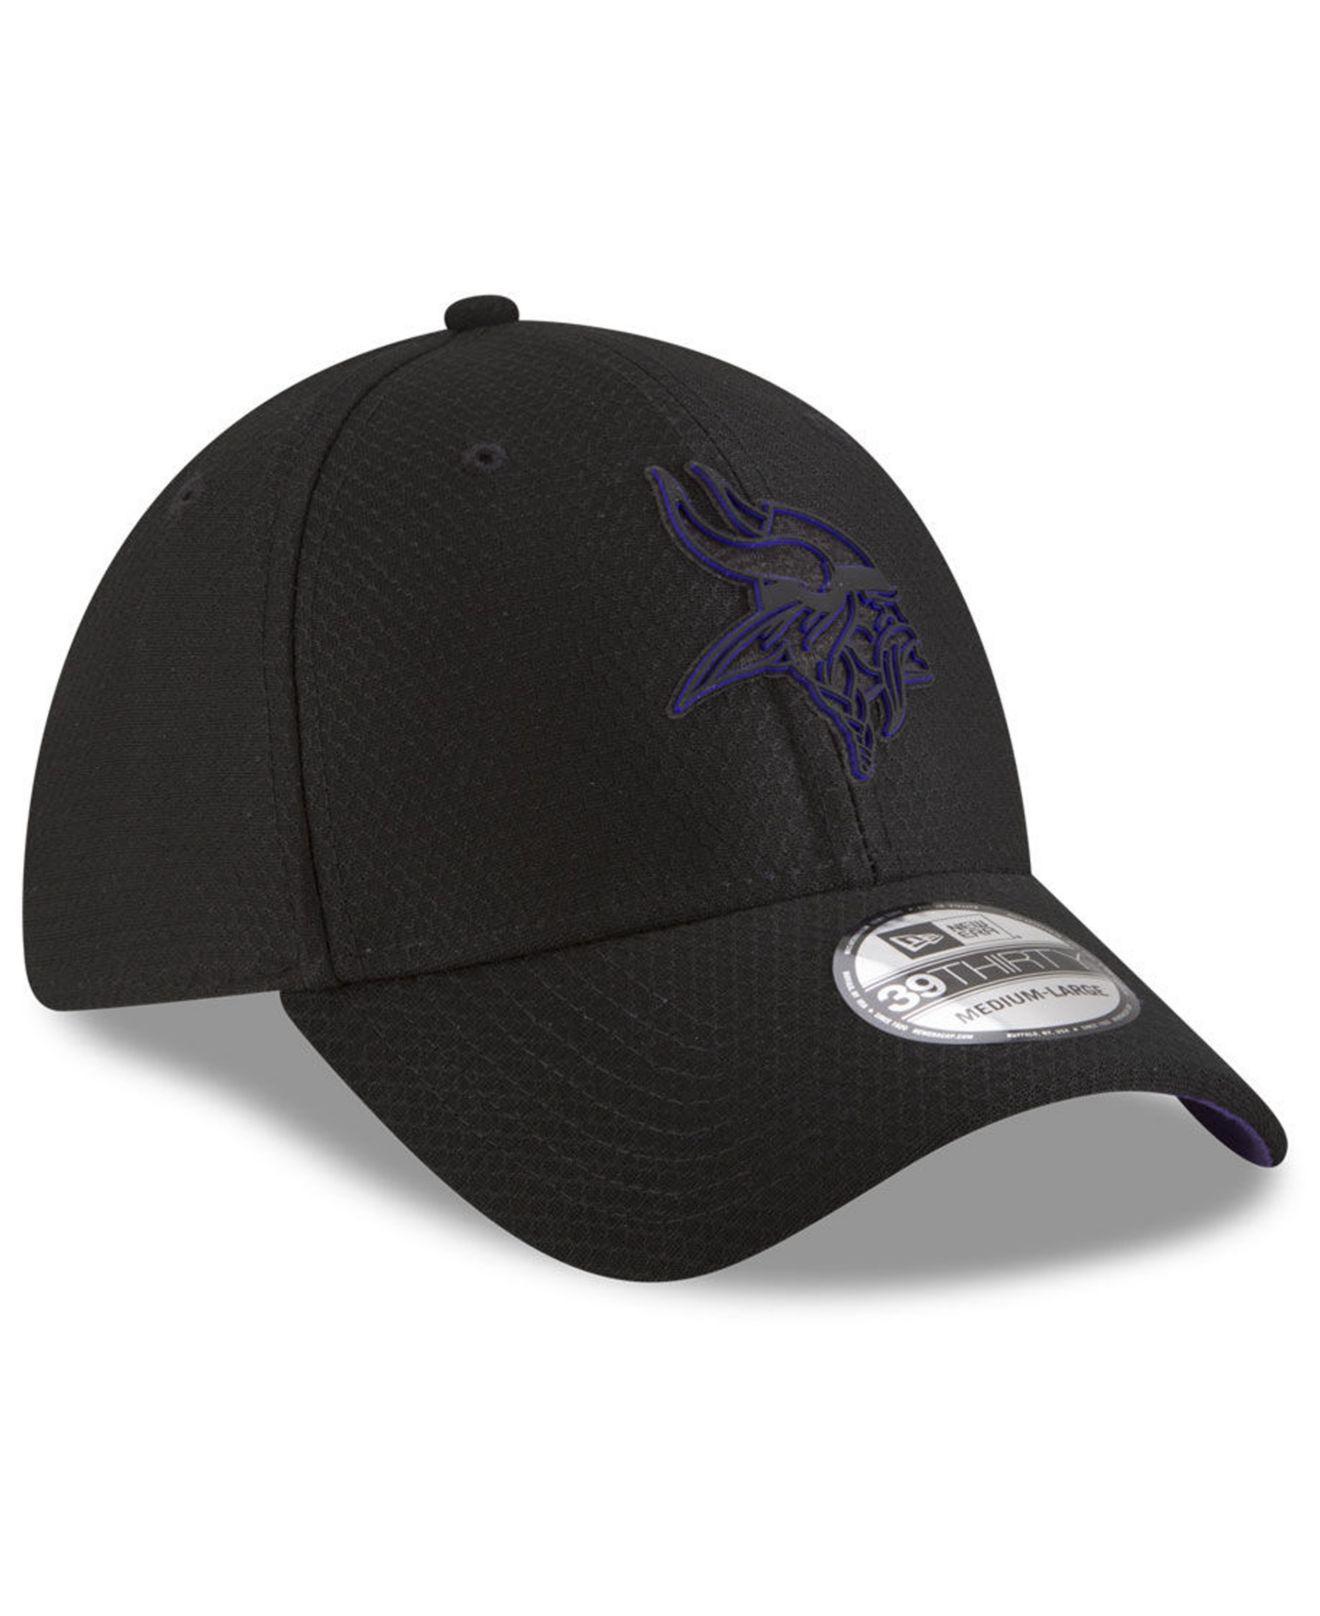 ff6ce5776 KTZ - Black Minnesota Vikings Training 39thirty Stretch Fitted Cap 2018 for  Men - Lyst. View fullscreen